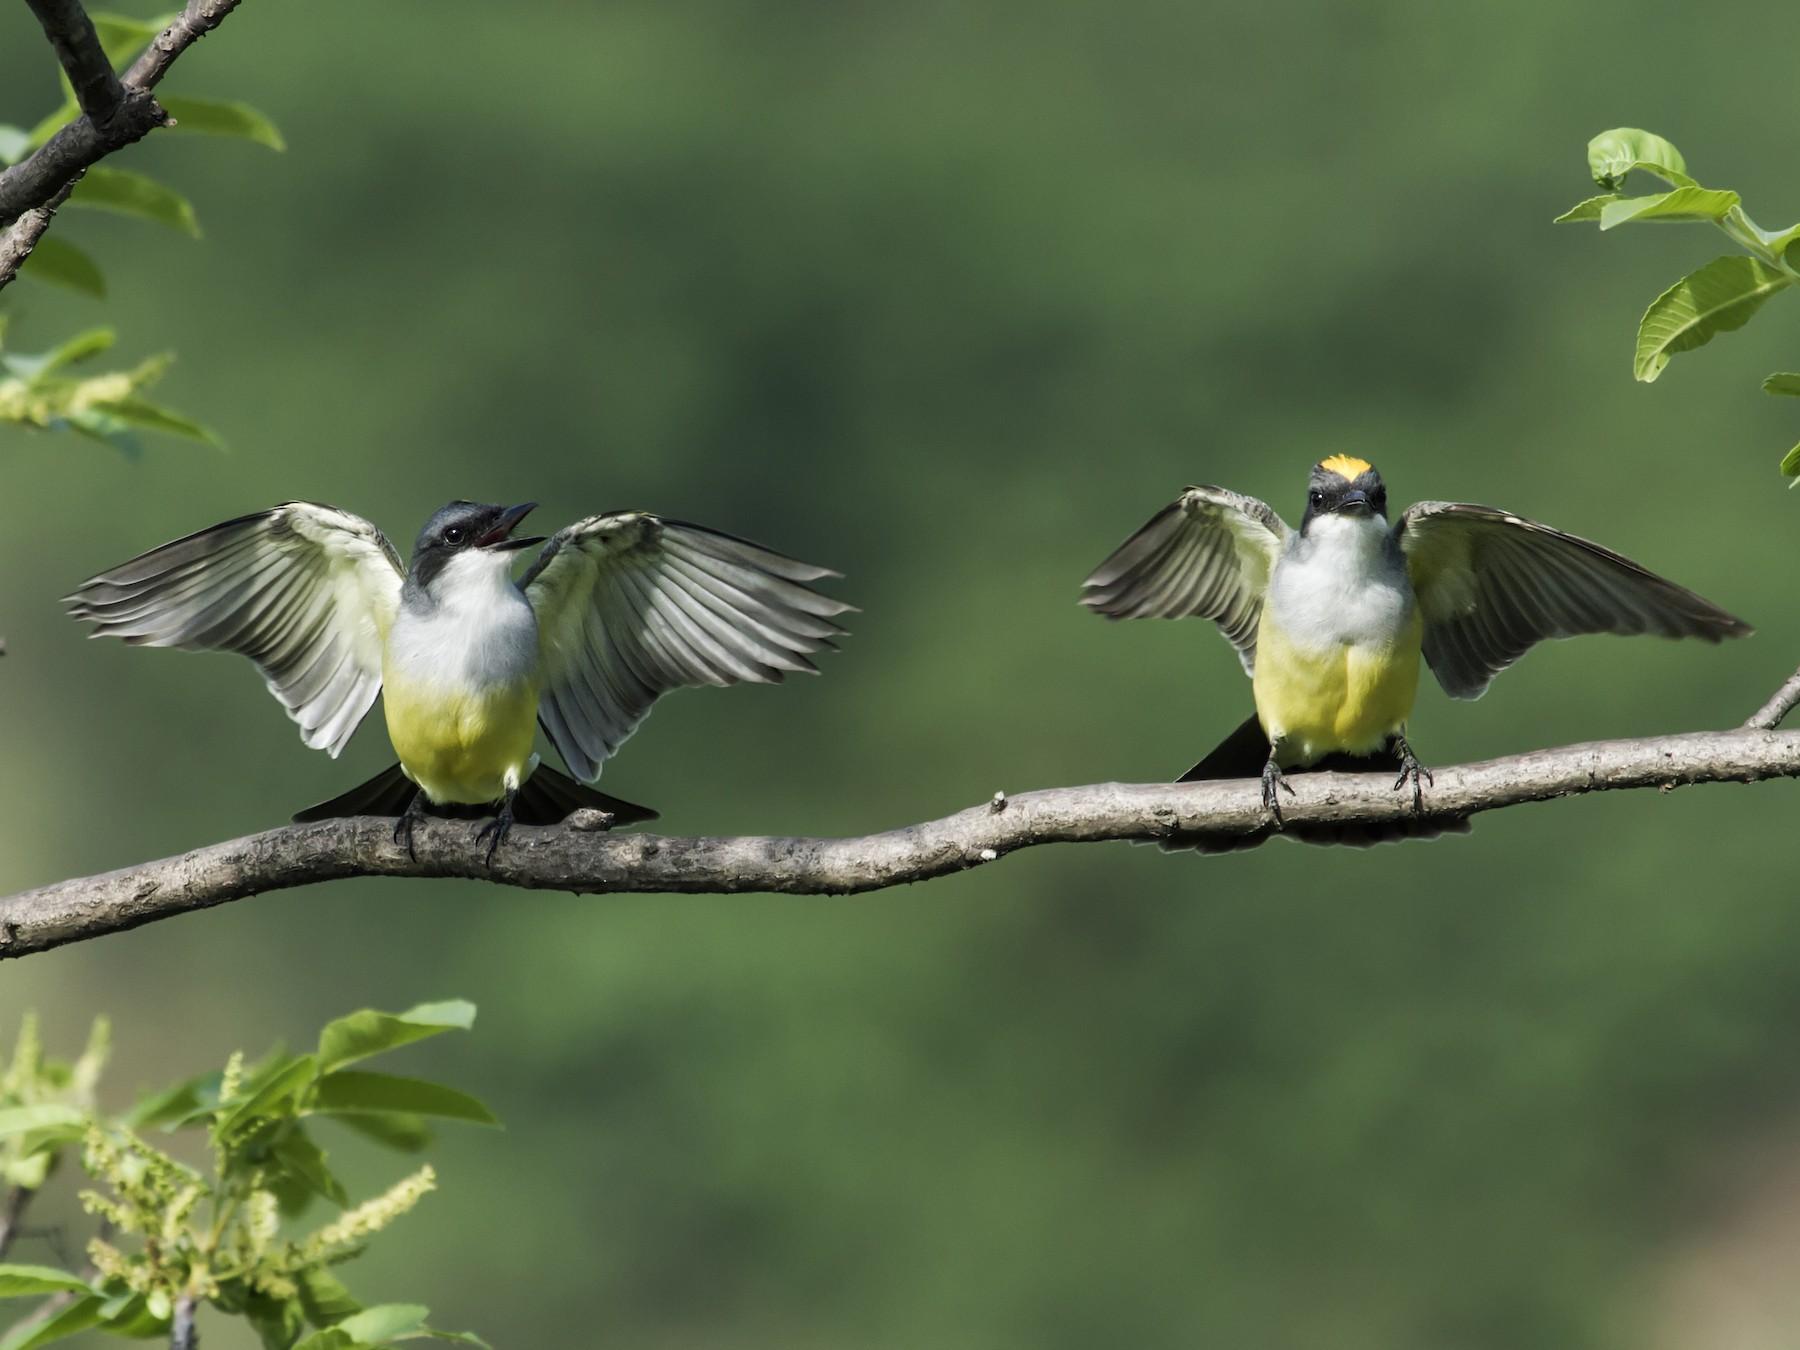 Snowy-throated Kingbird - Nick Athanas